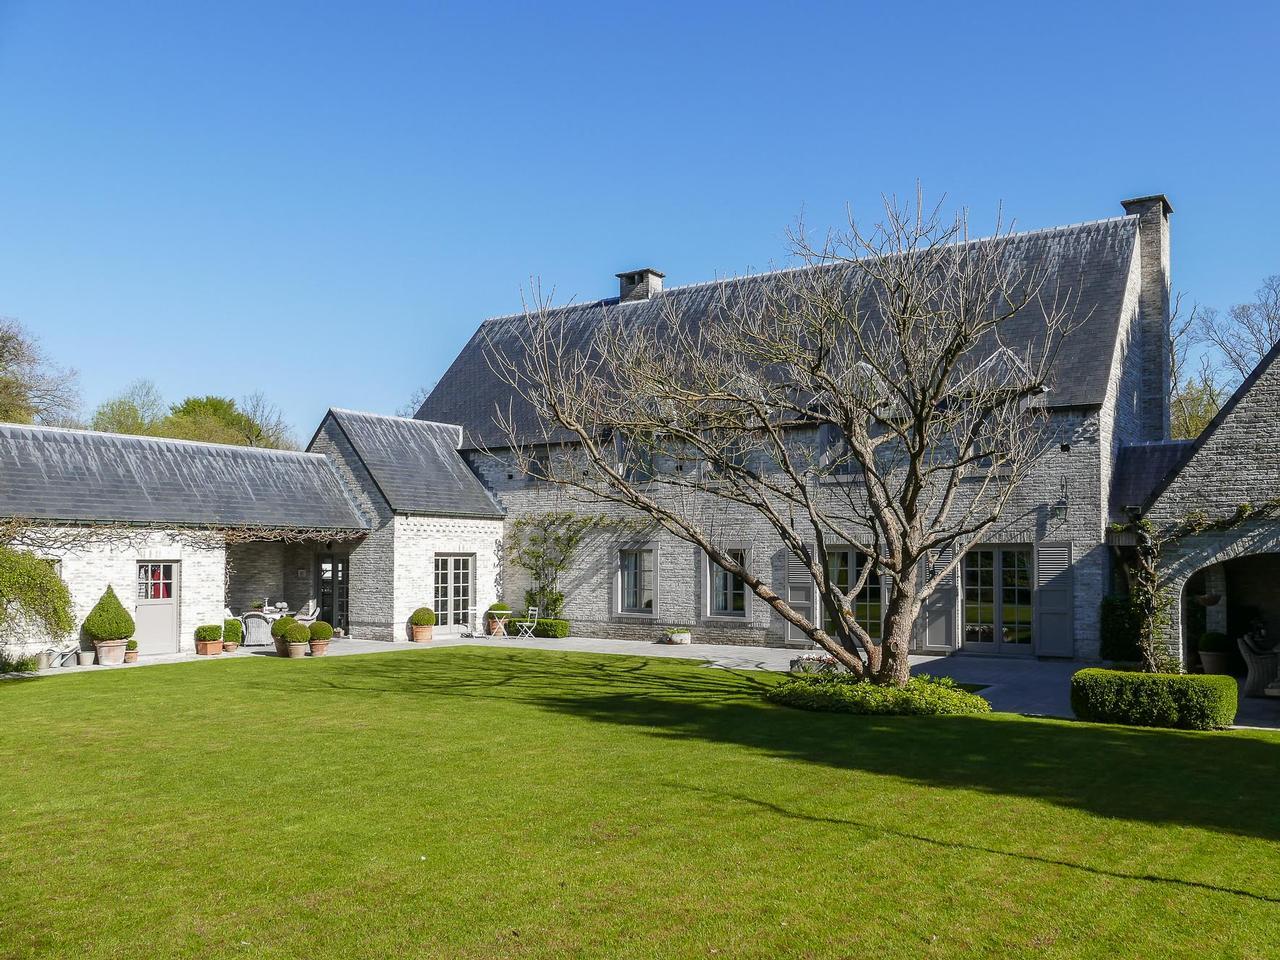 Other Residential for Sale at Wemmel I Bouchout Other Belgium, Other Areas In Belgium, 1780 Belgium